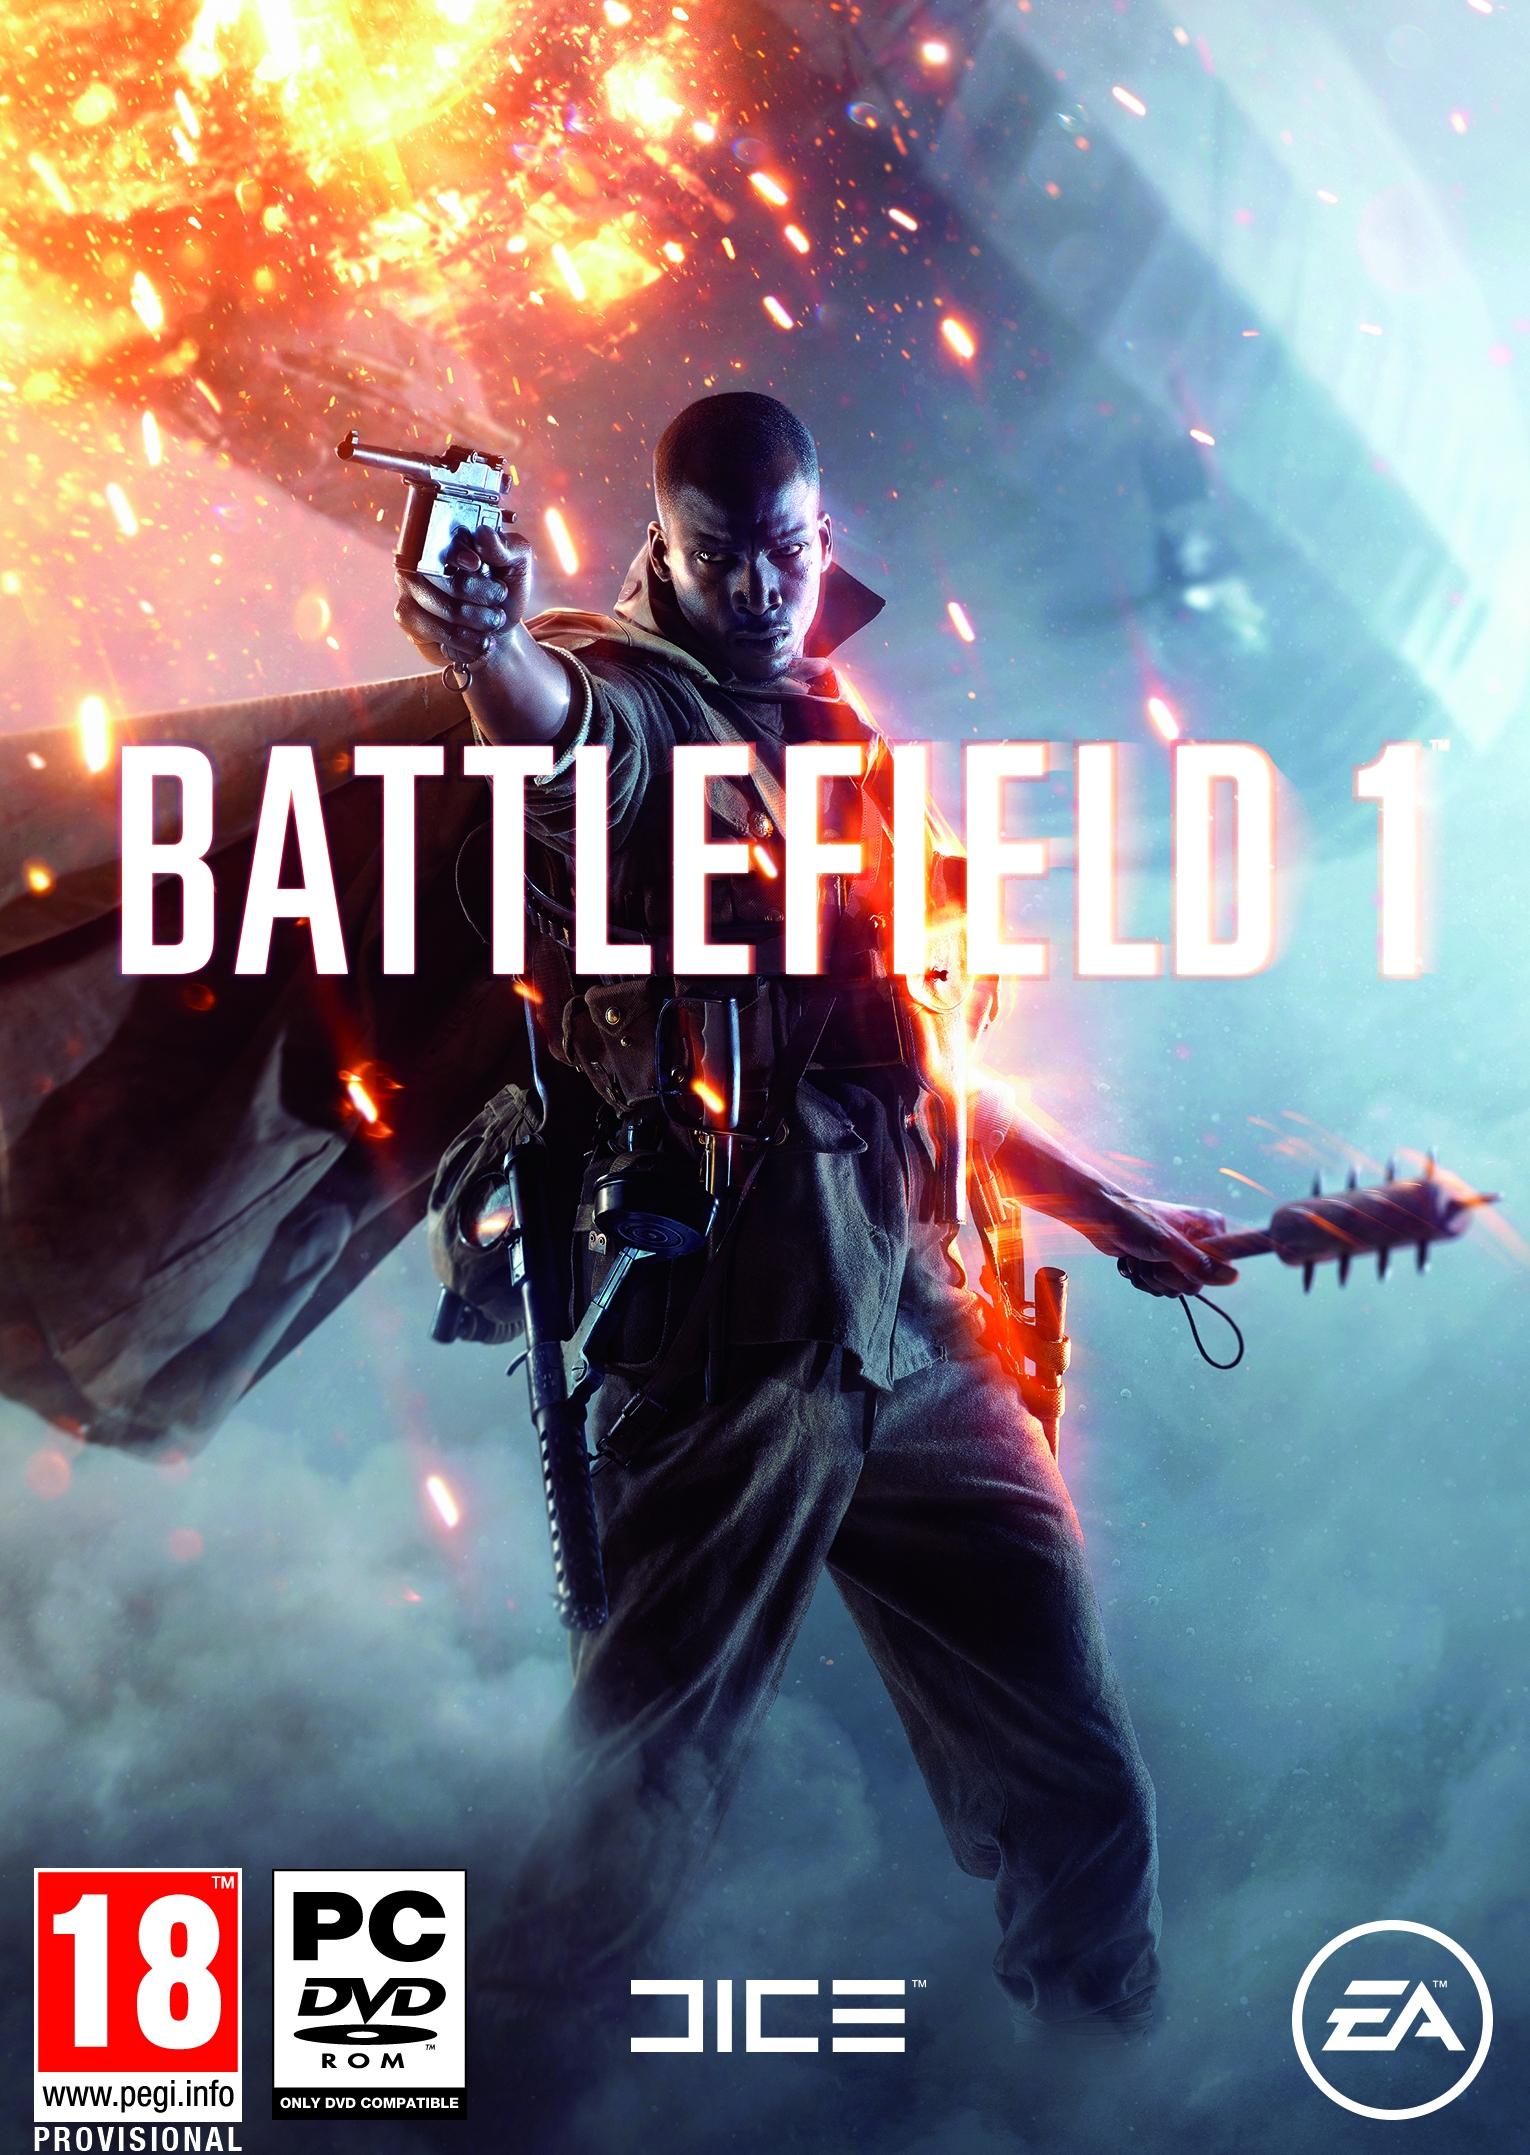 Is Battlefield 1 Cross Platform